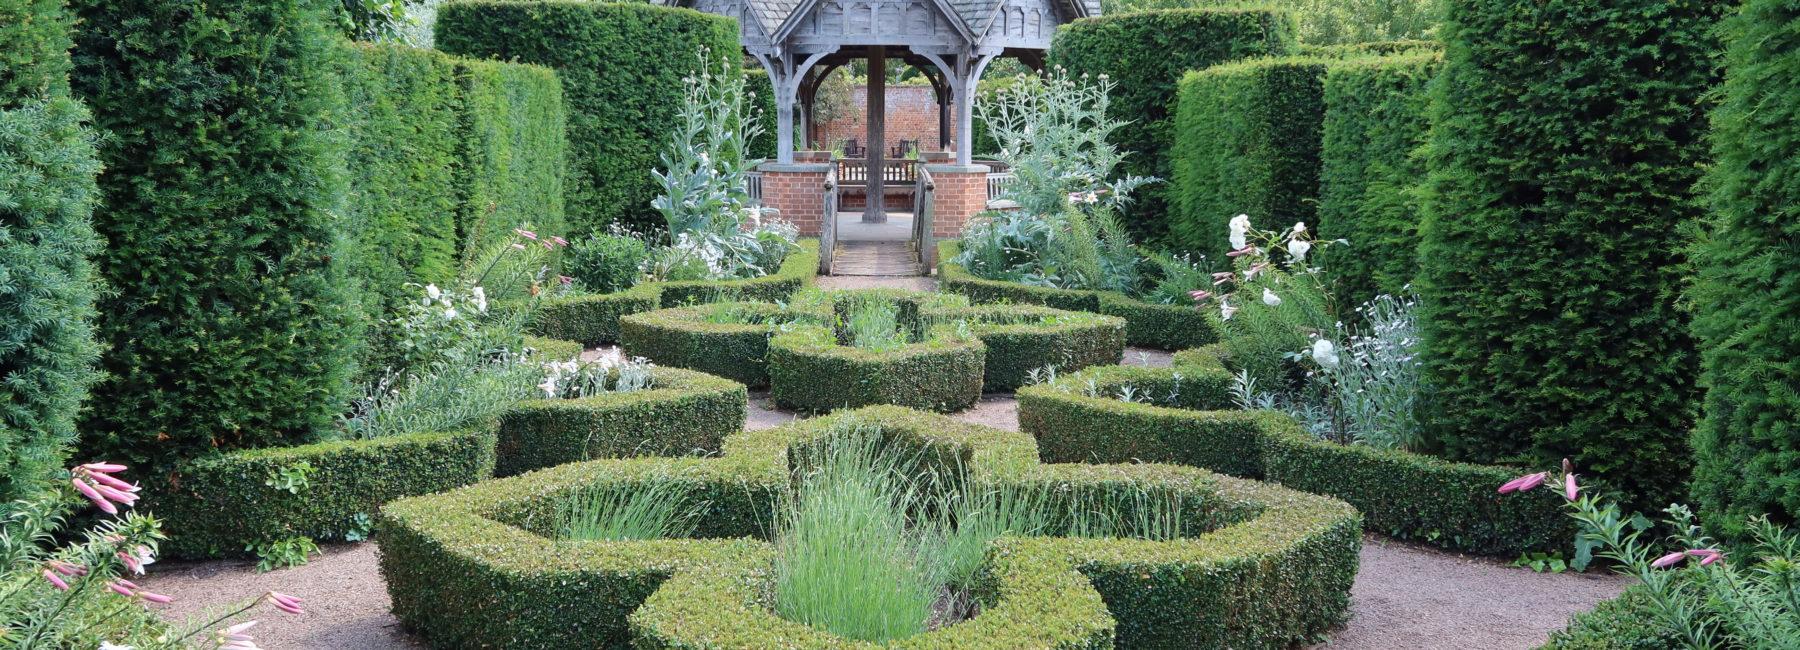 Pavilion with formal box hedges